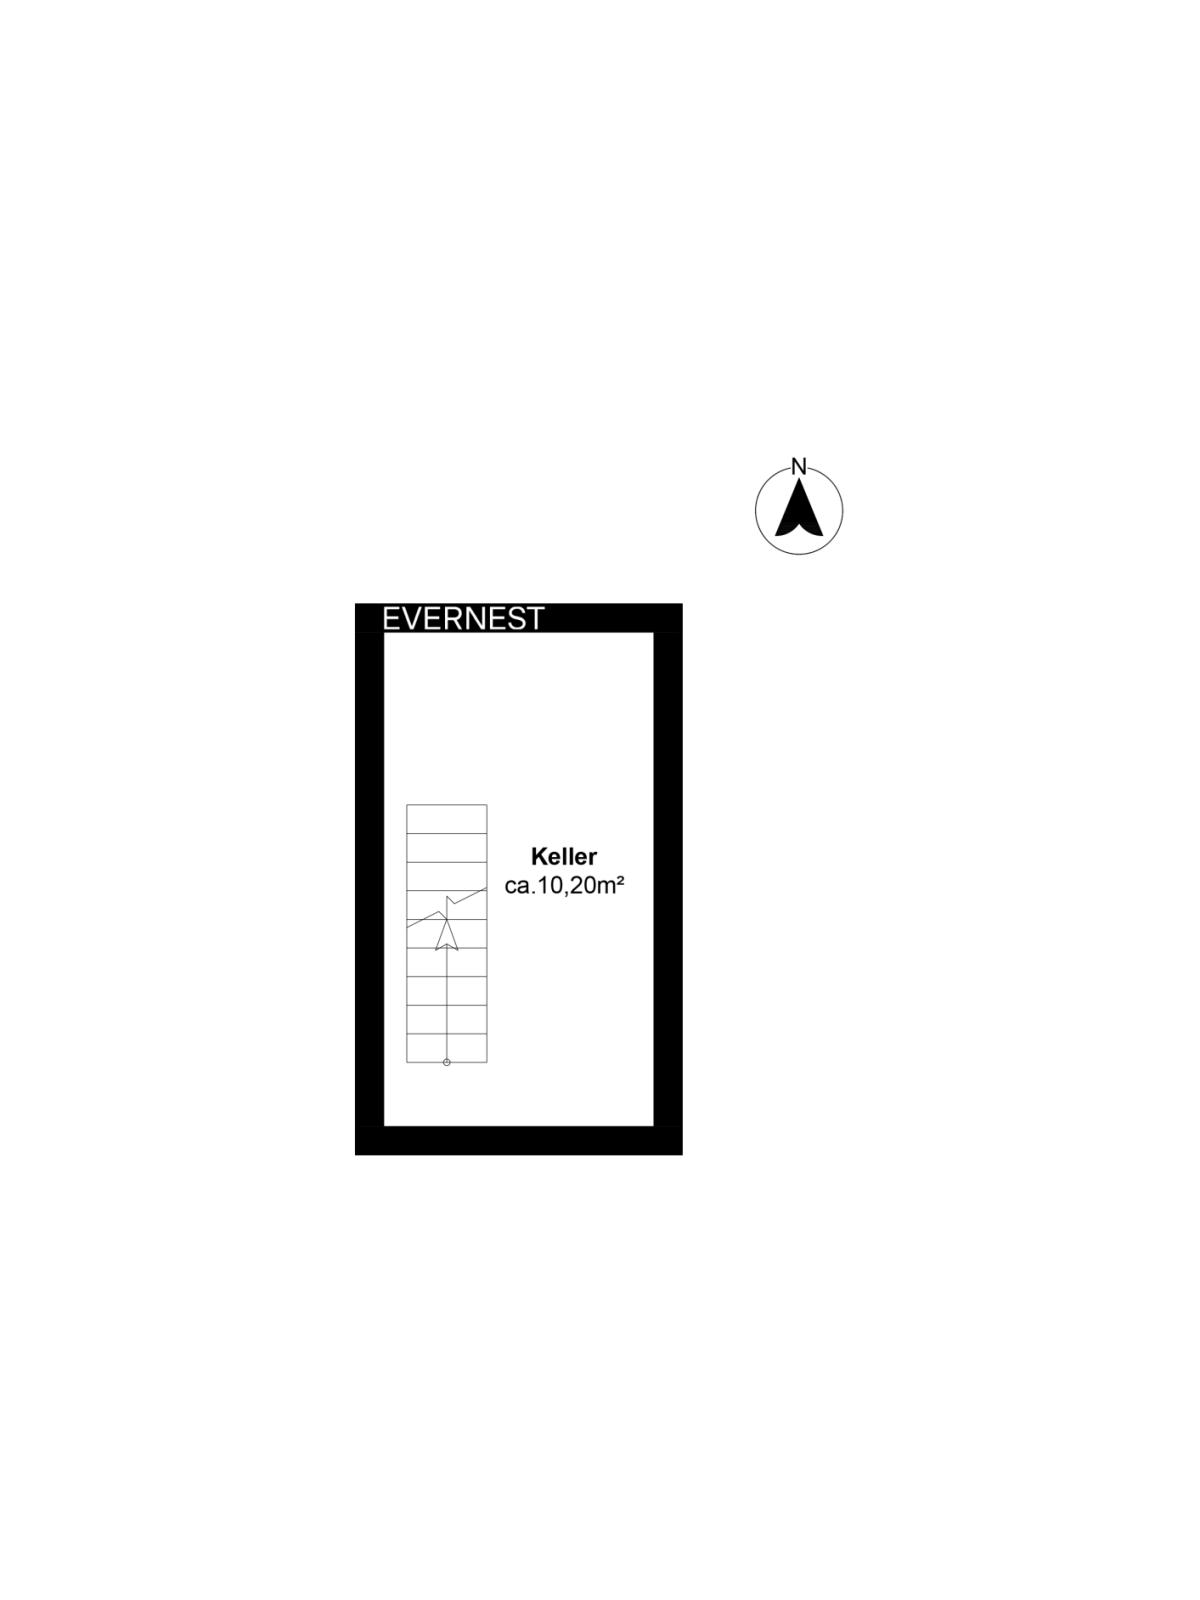 Der Grundriss des Kellergeschosses